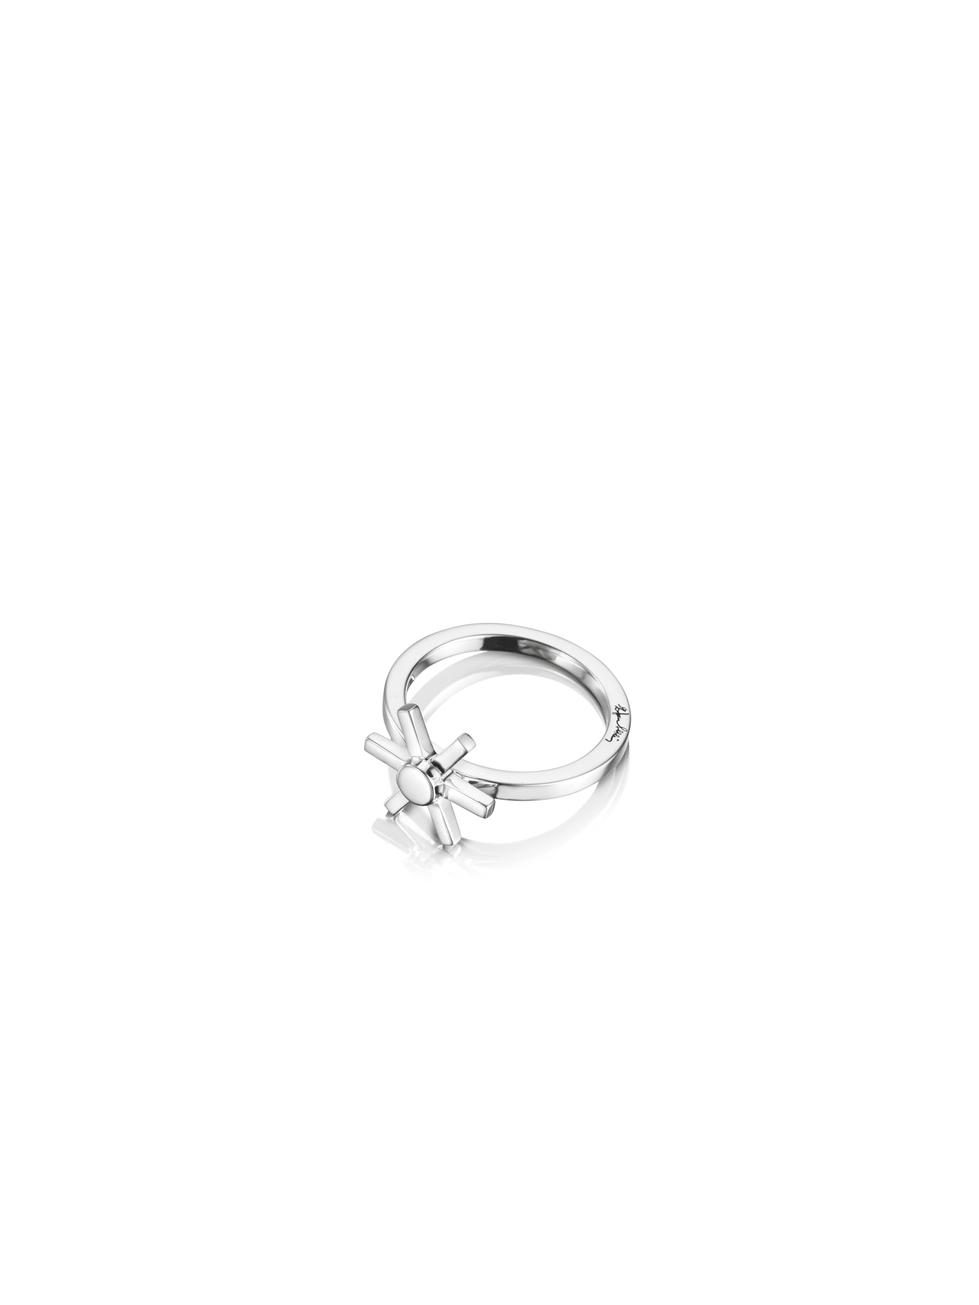 Starflower Ring 13-100-01220(2)